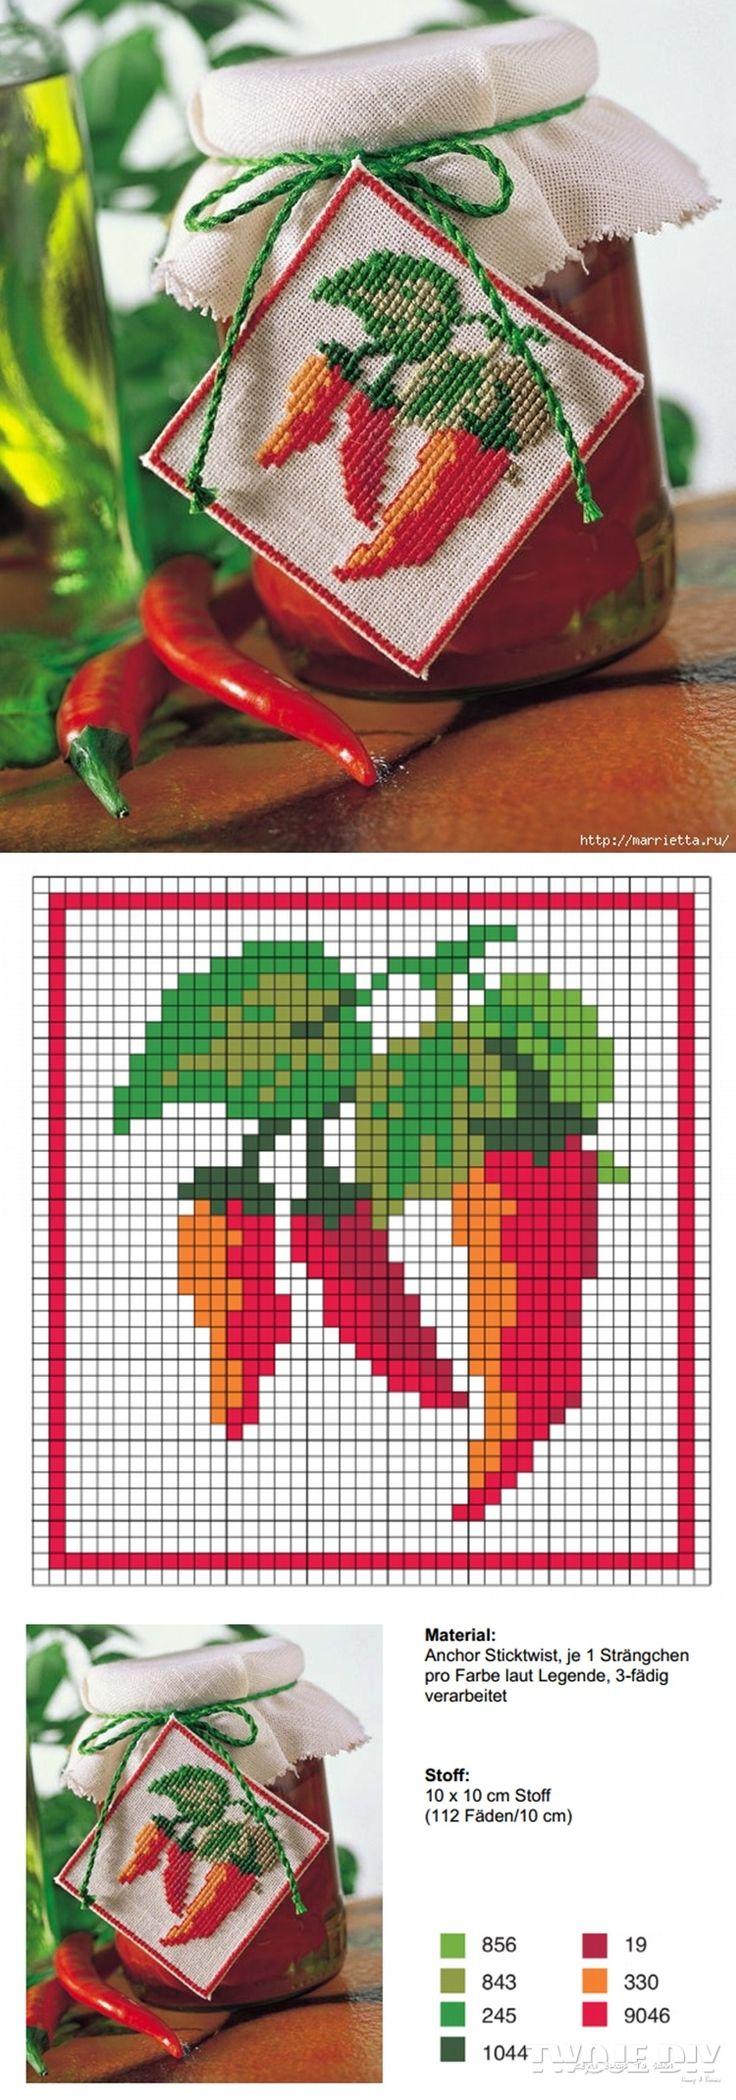 Haftowane etykiety, pepper,  pimiento, vegetables, perler beads, hama beads, bead sprites, nabbi fuse melty beads